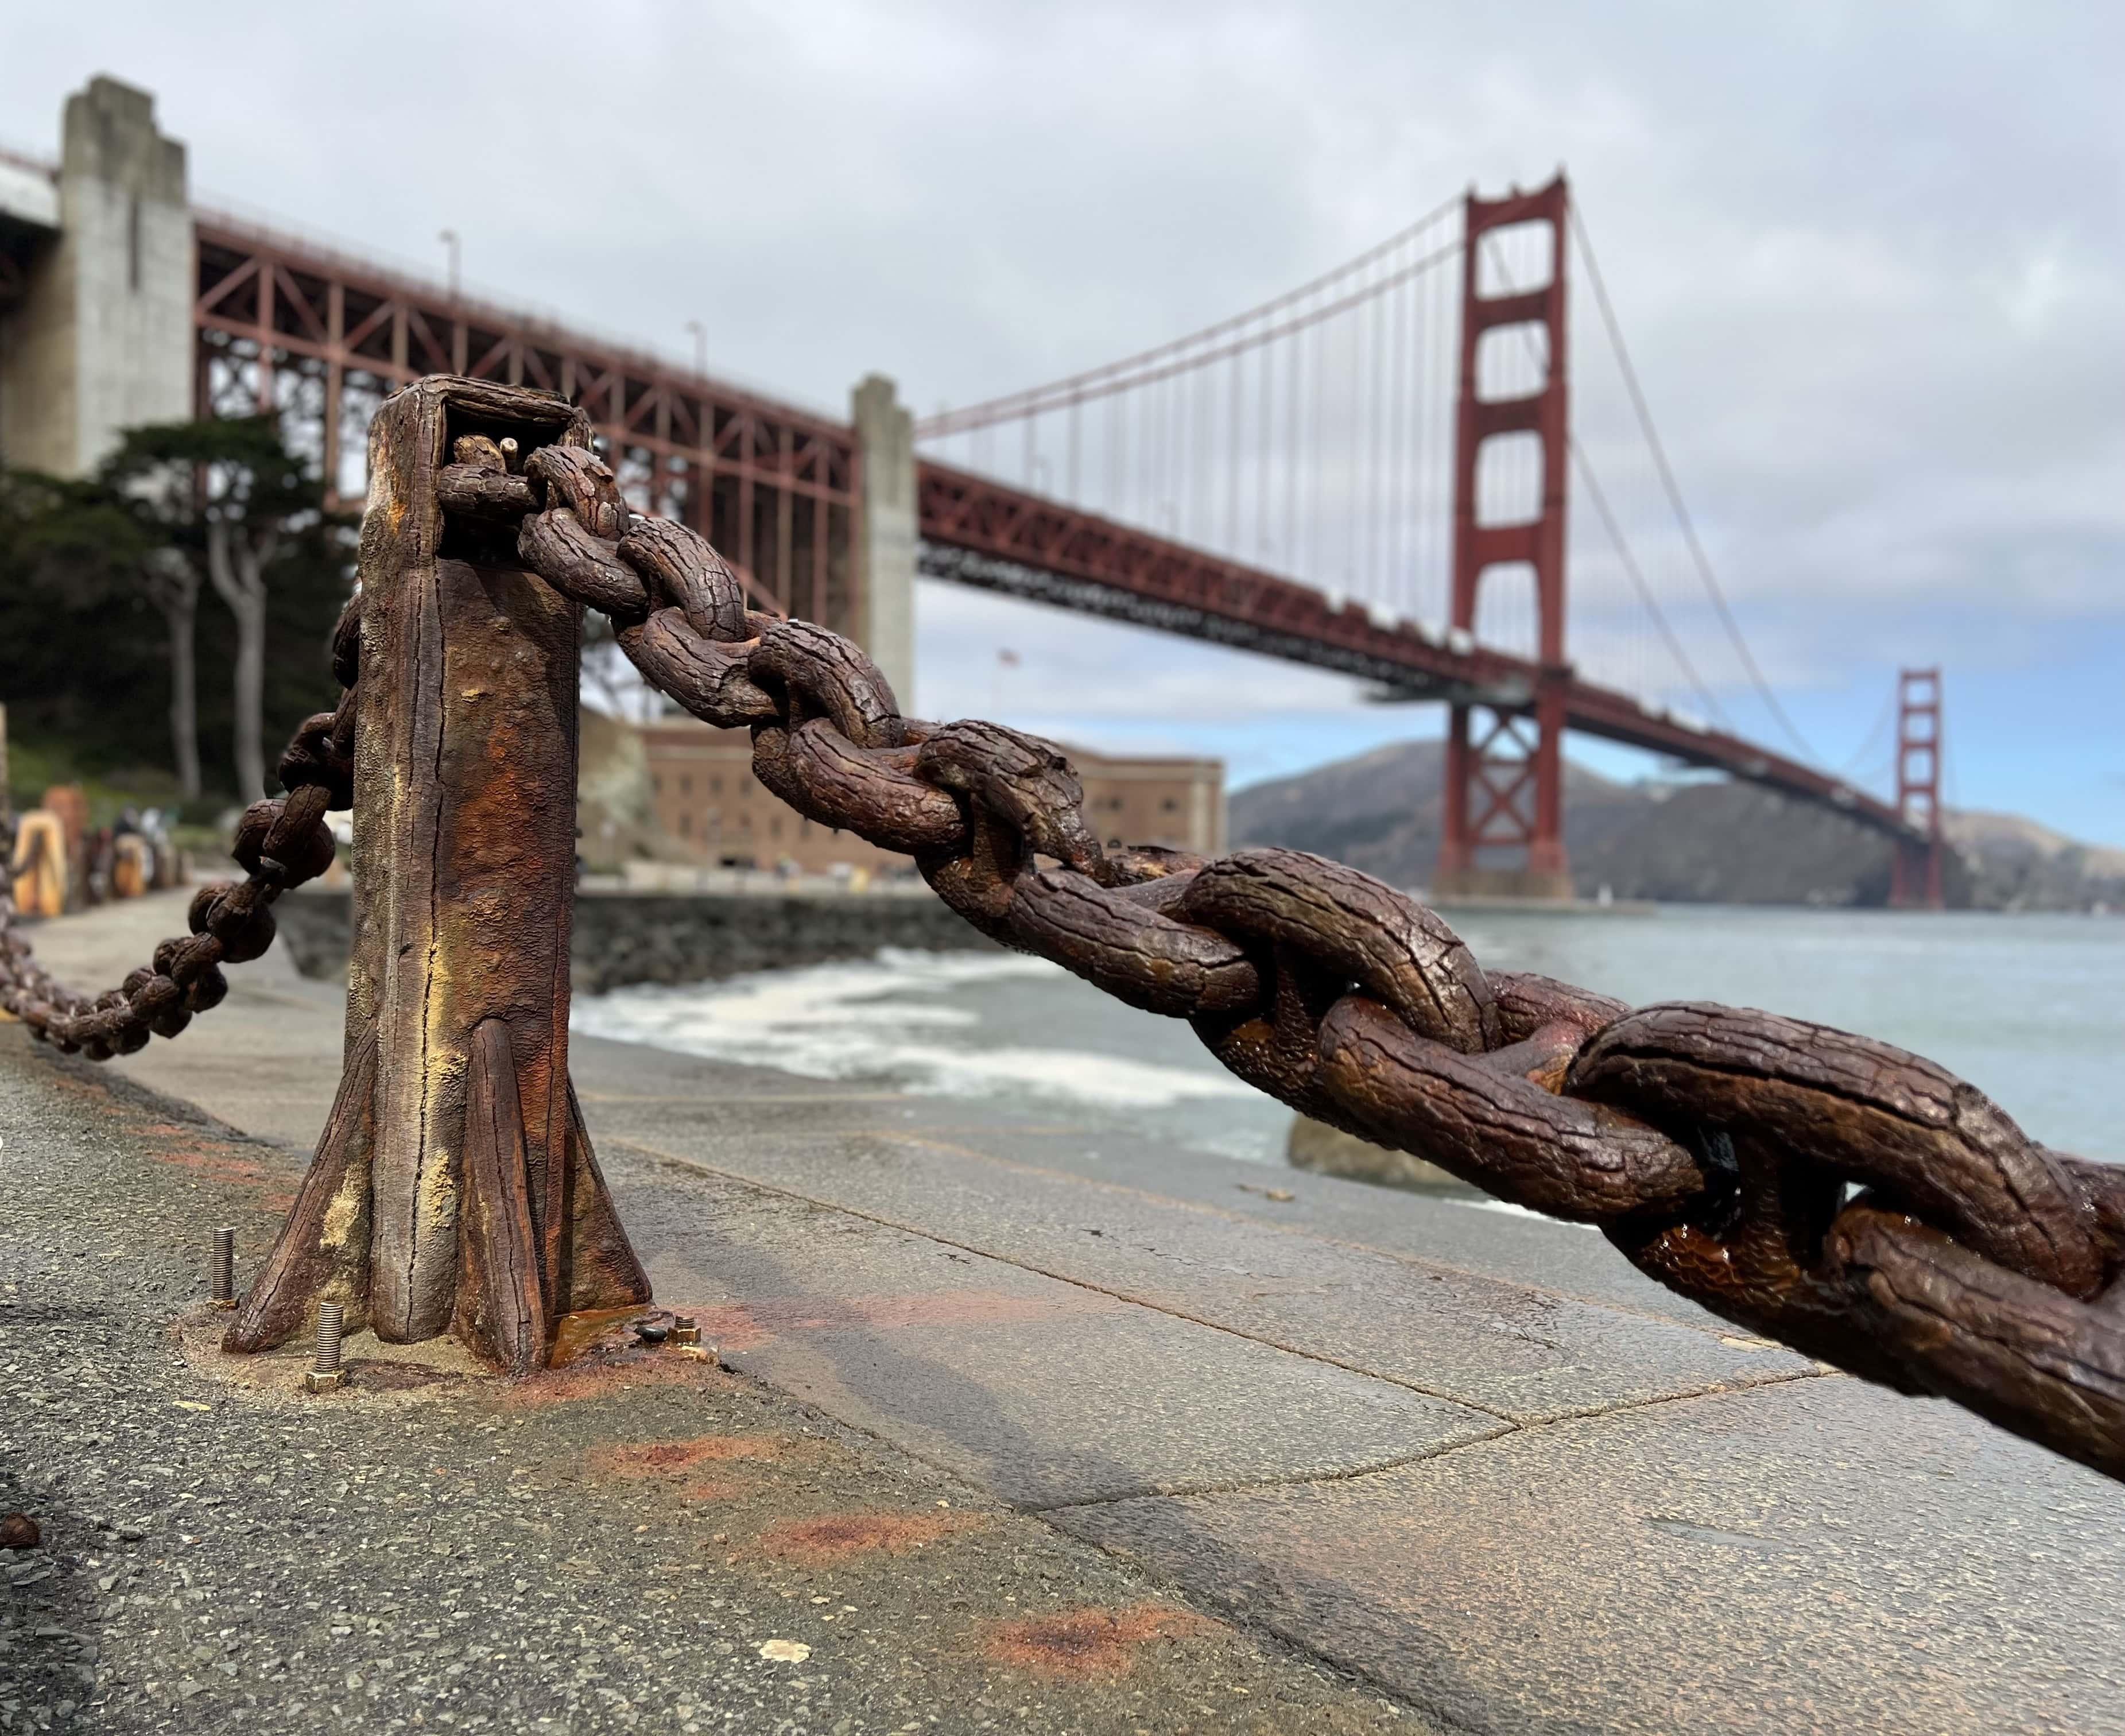 iPhone 13 Pro test shot of Golden Gate Bridge